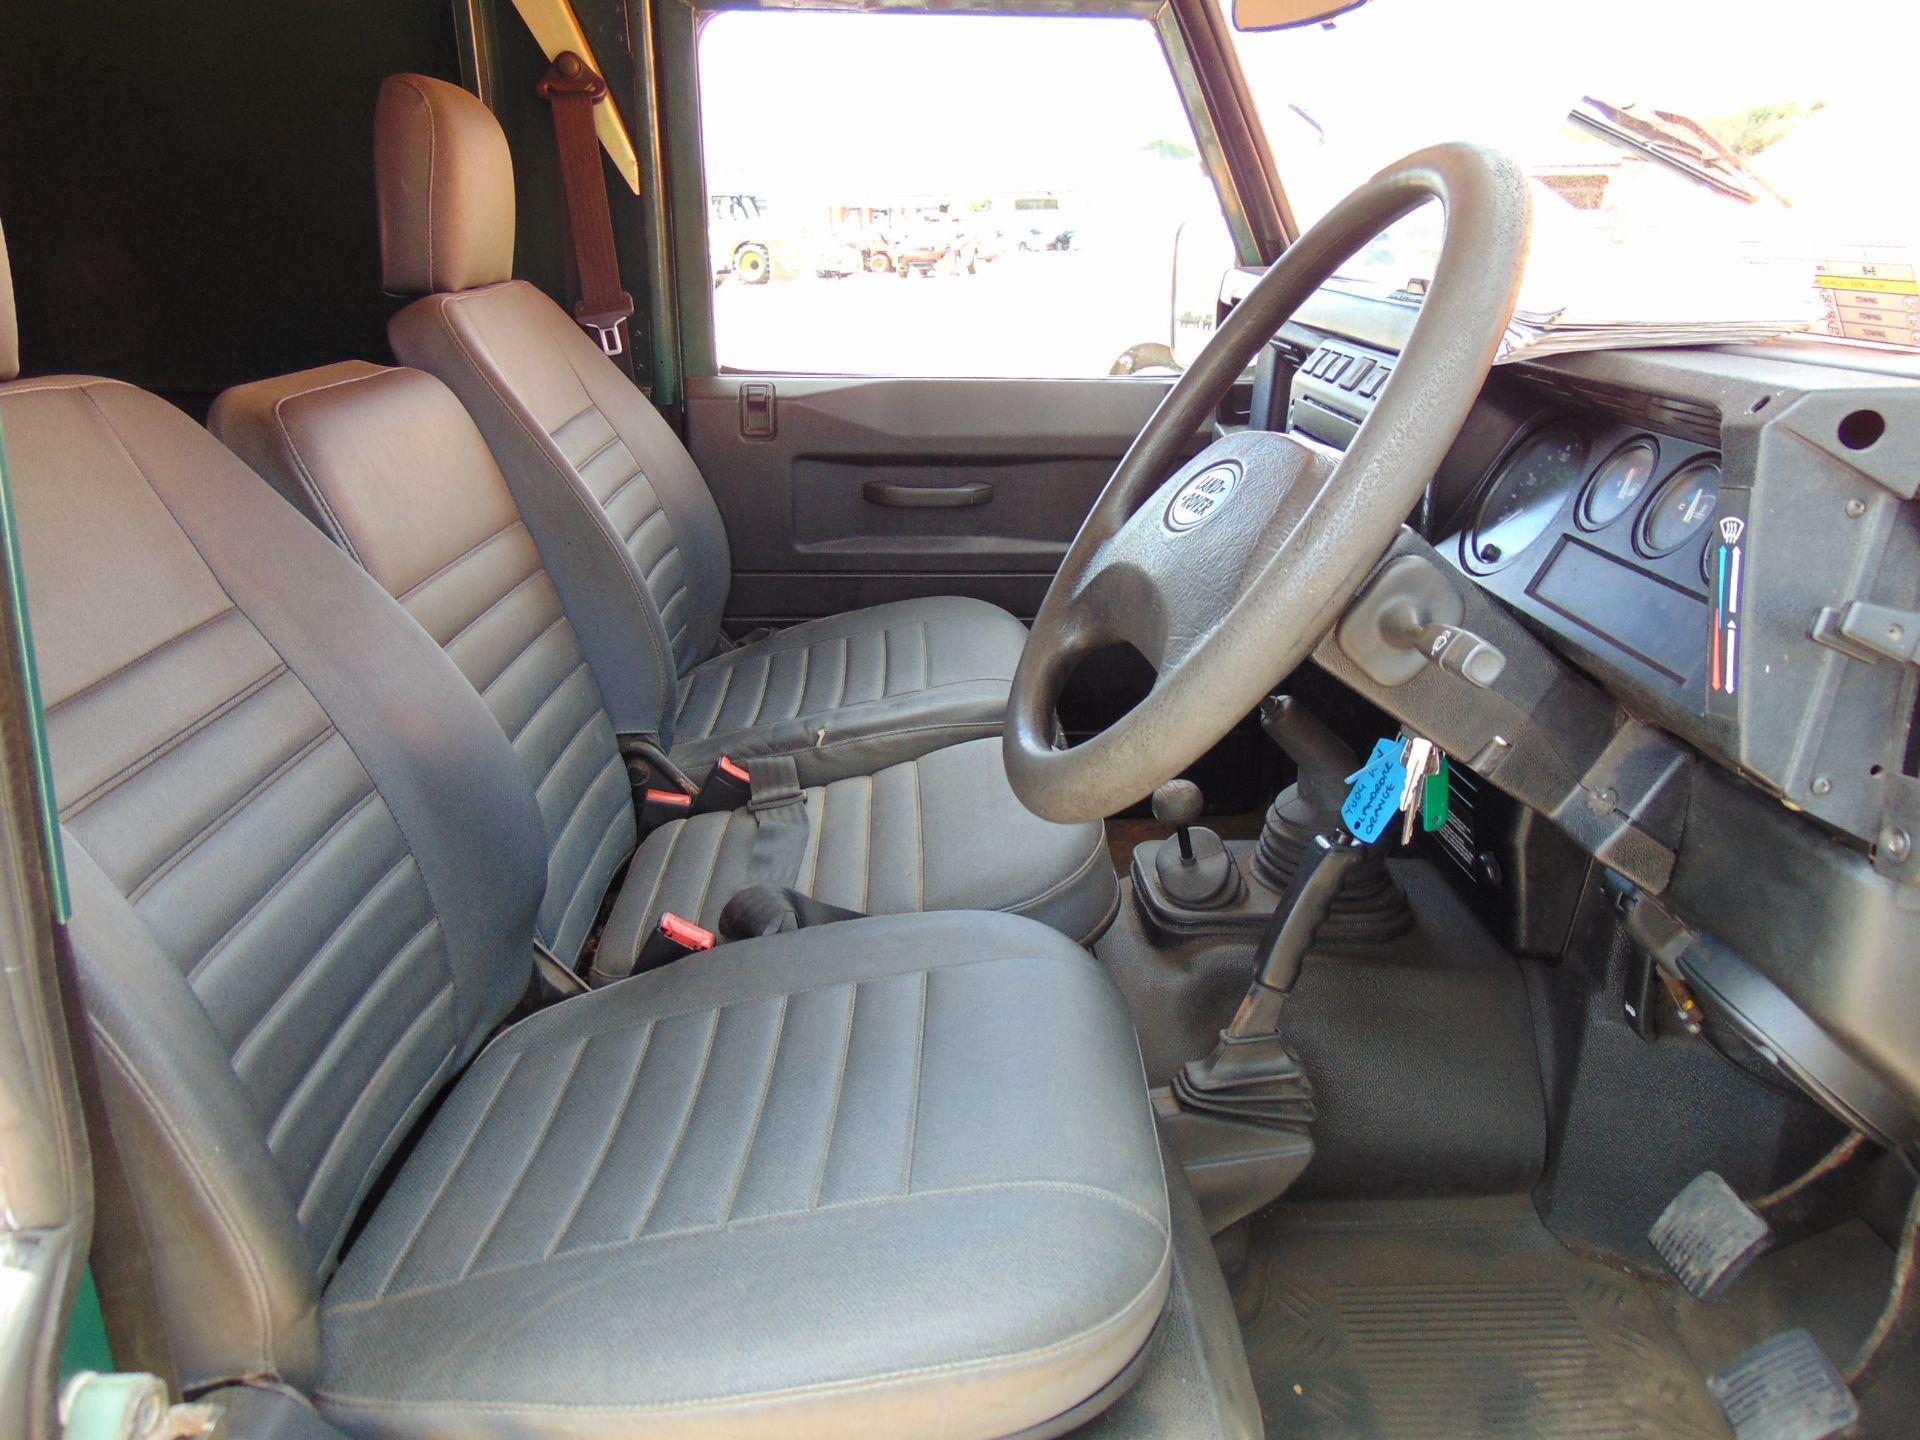 Lot 34 - Land Rover 110 TD5 Hard Top